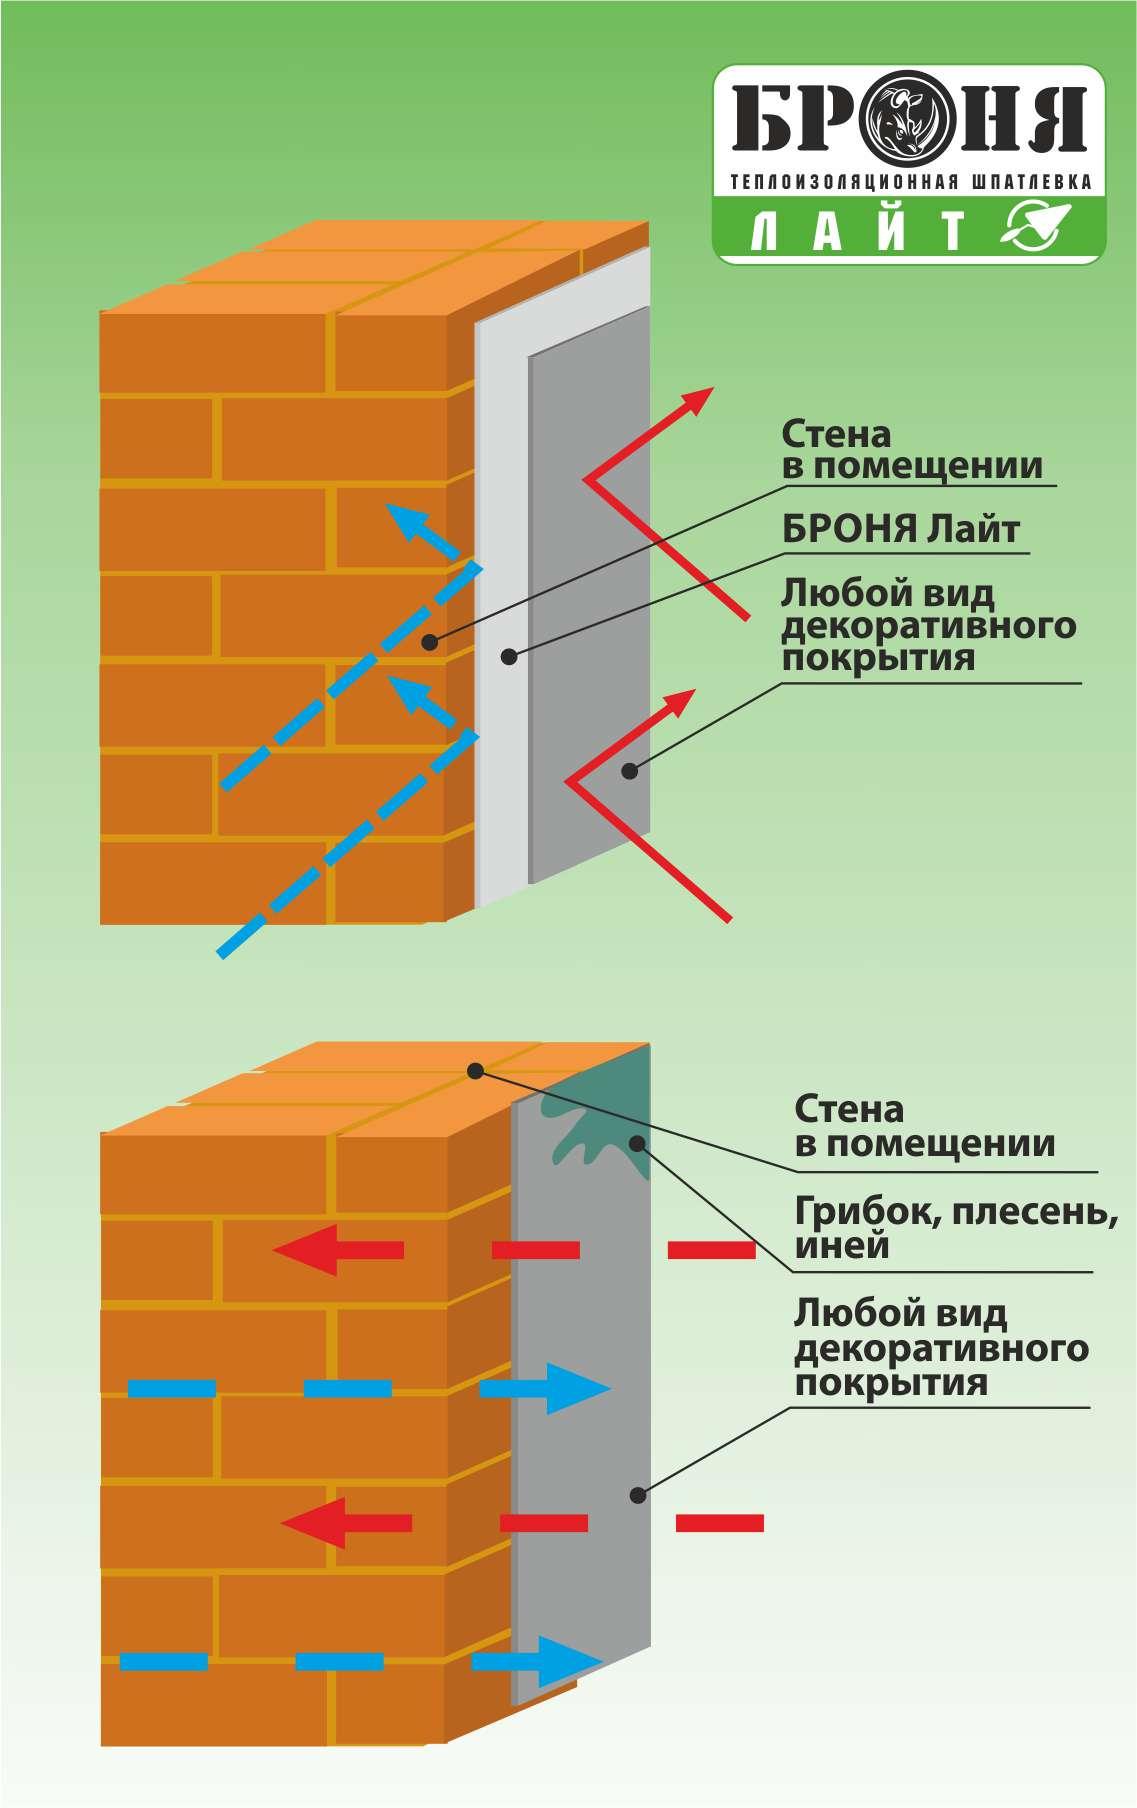 Сверхтонкая теплоизоляция модификации броня фасад и броня фасад нг